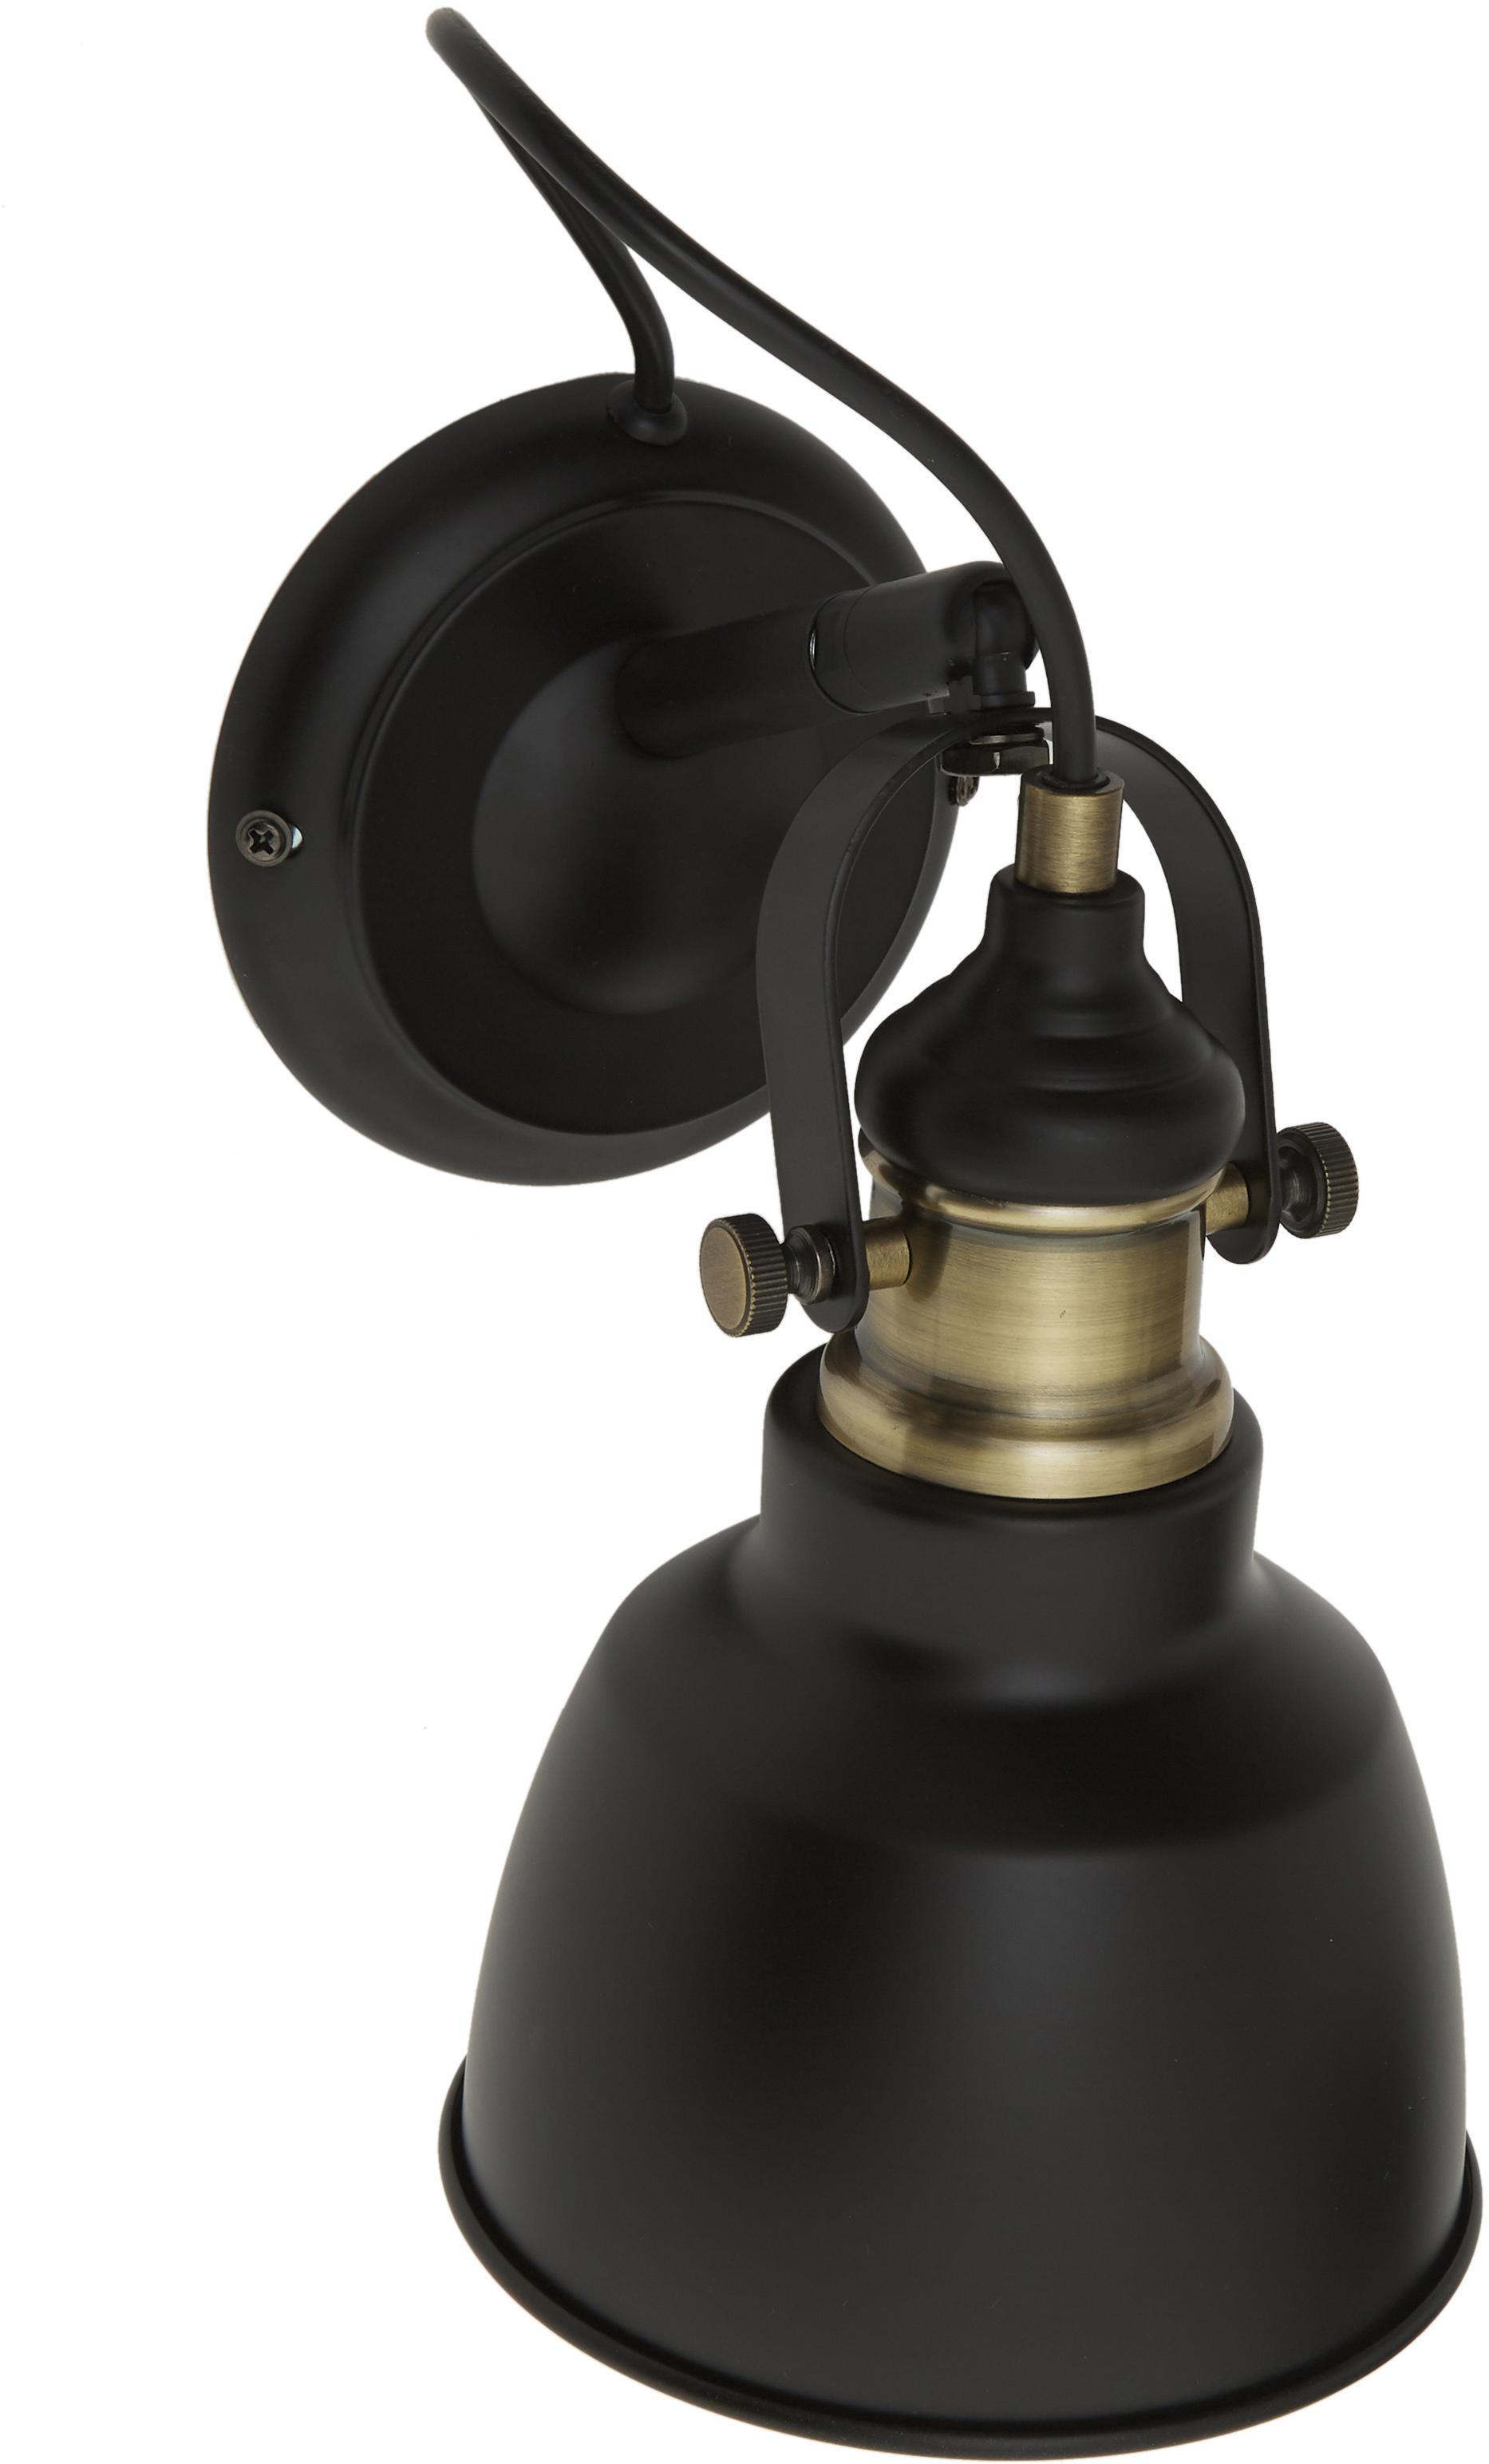 Wandlamp Thornford, Zwart, messingkleurig, 15 x 20 cm